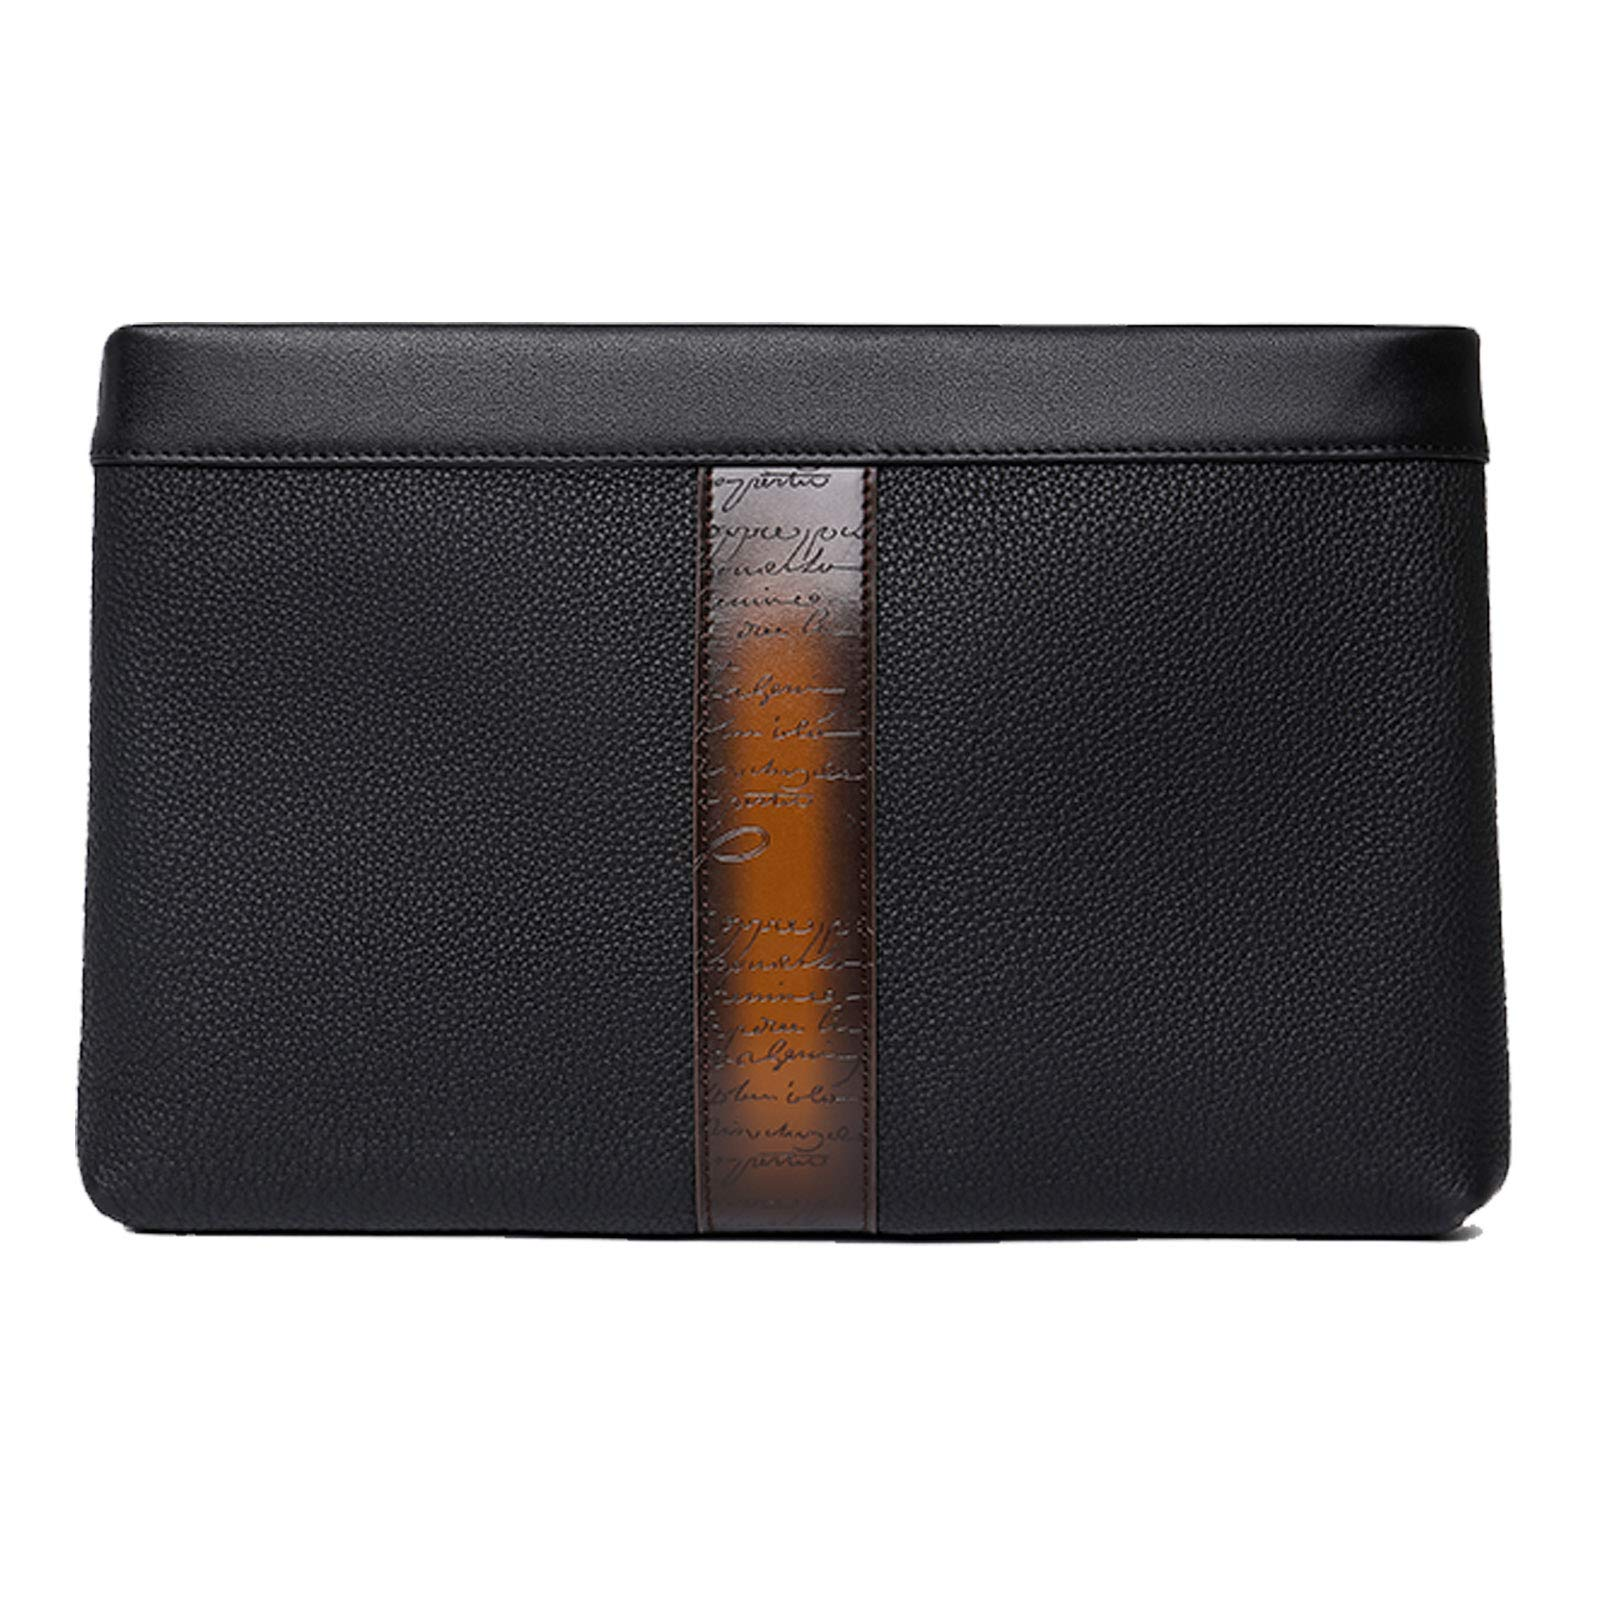 TERSE Men's Leather Wallet Clutch Purse Long Wallet Phone Case With Card Cash Holder - Italian Calfskin